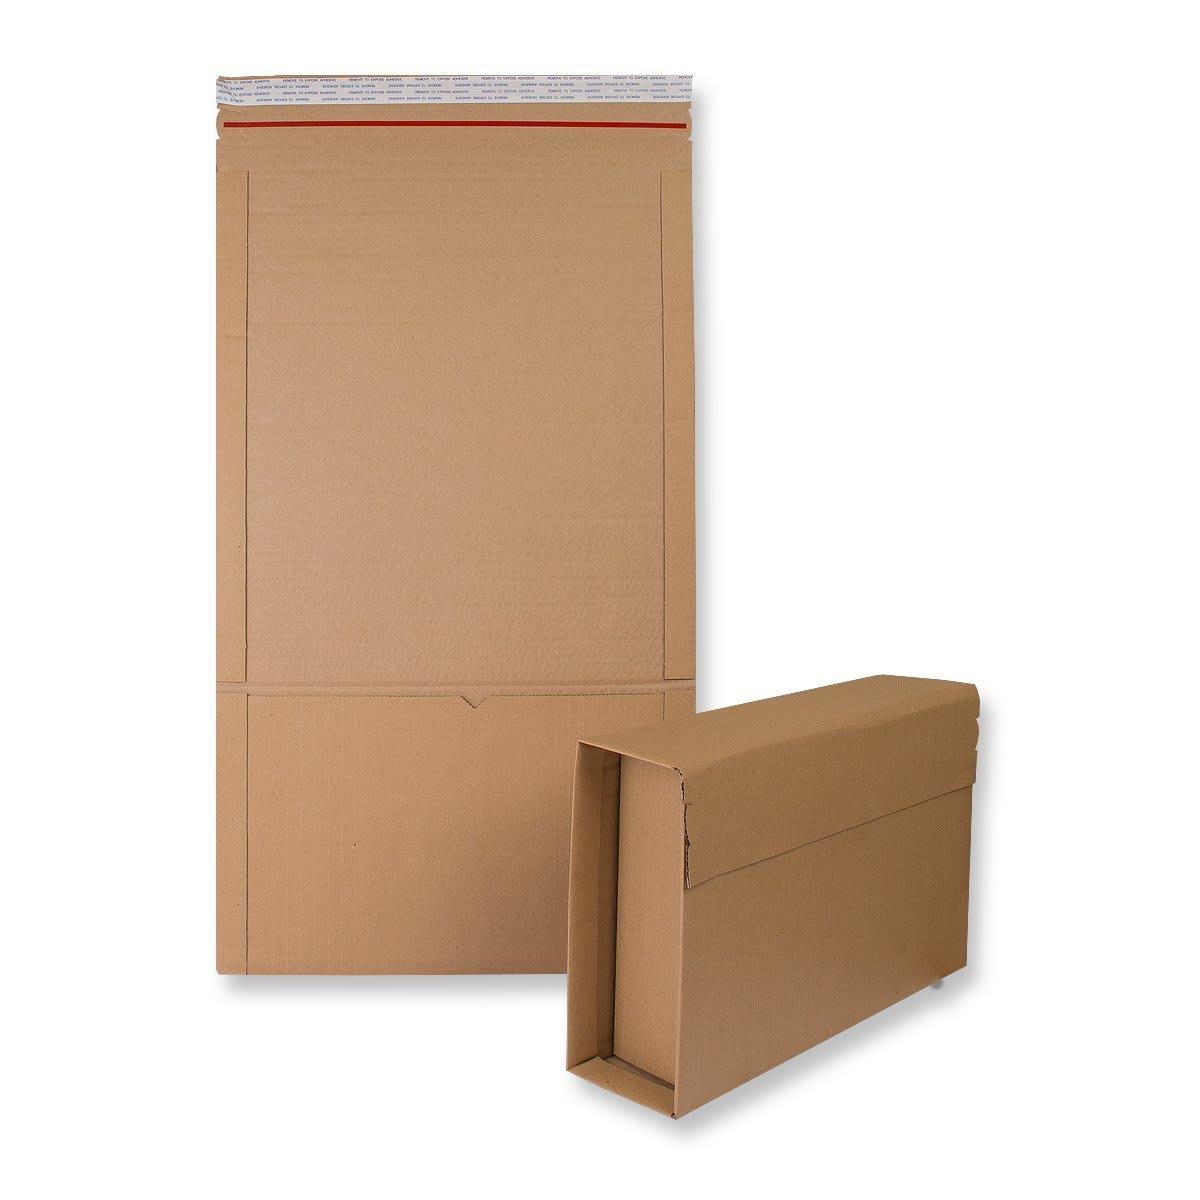 C3 Book Wrap Mailer (302 mm x 215 mm)